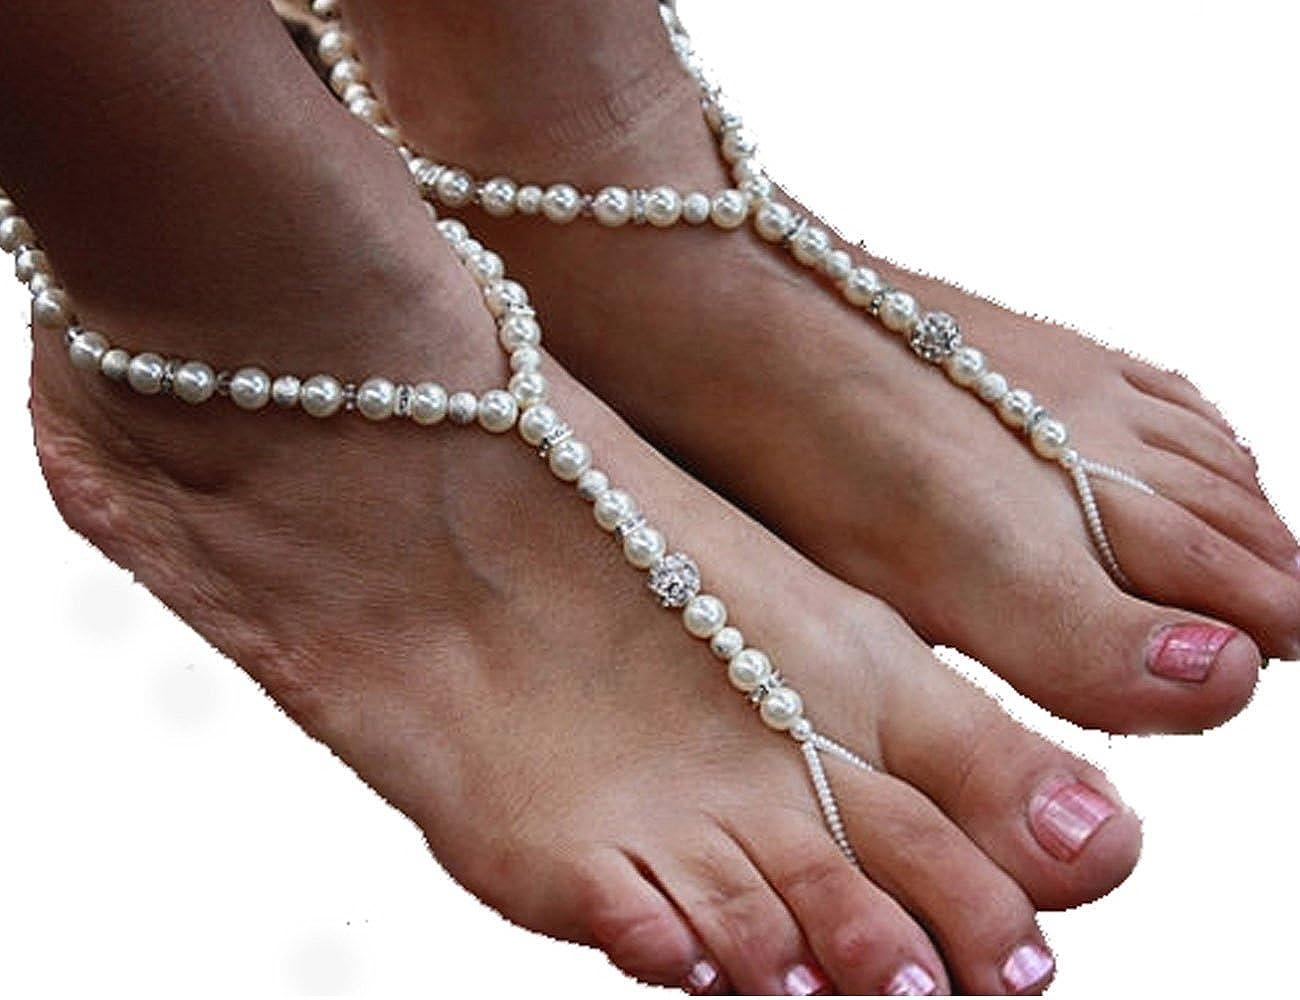 a7917b206c2f Amazon.com  Abandon Girl Crystal Barefoot Sandals Vacation Beach Fun  Jewelry Sexy Body Chain Wedding Jewelry Size 7-8  Jewelry